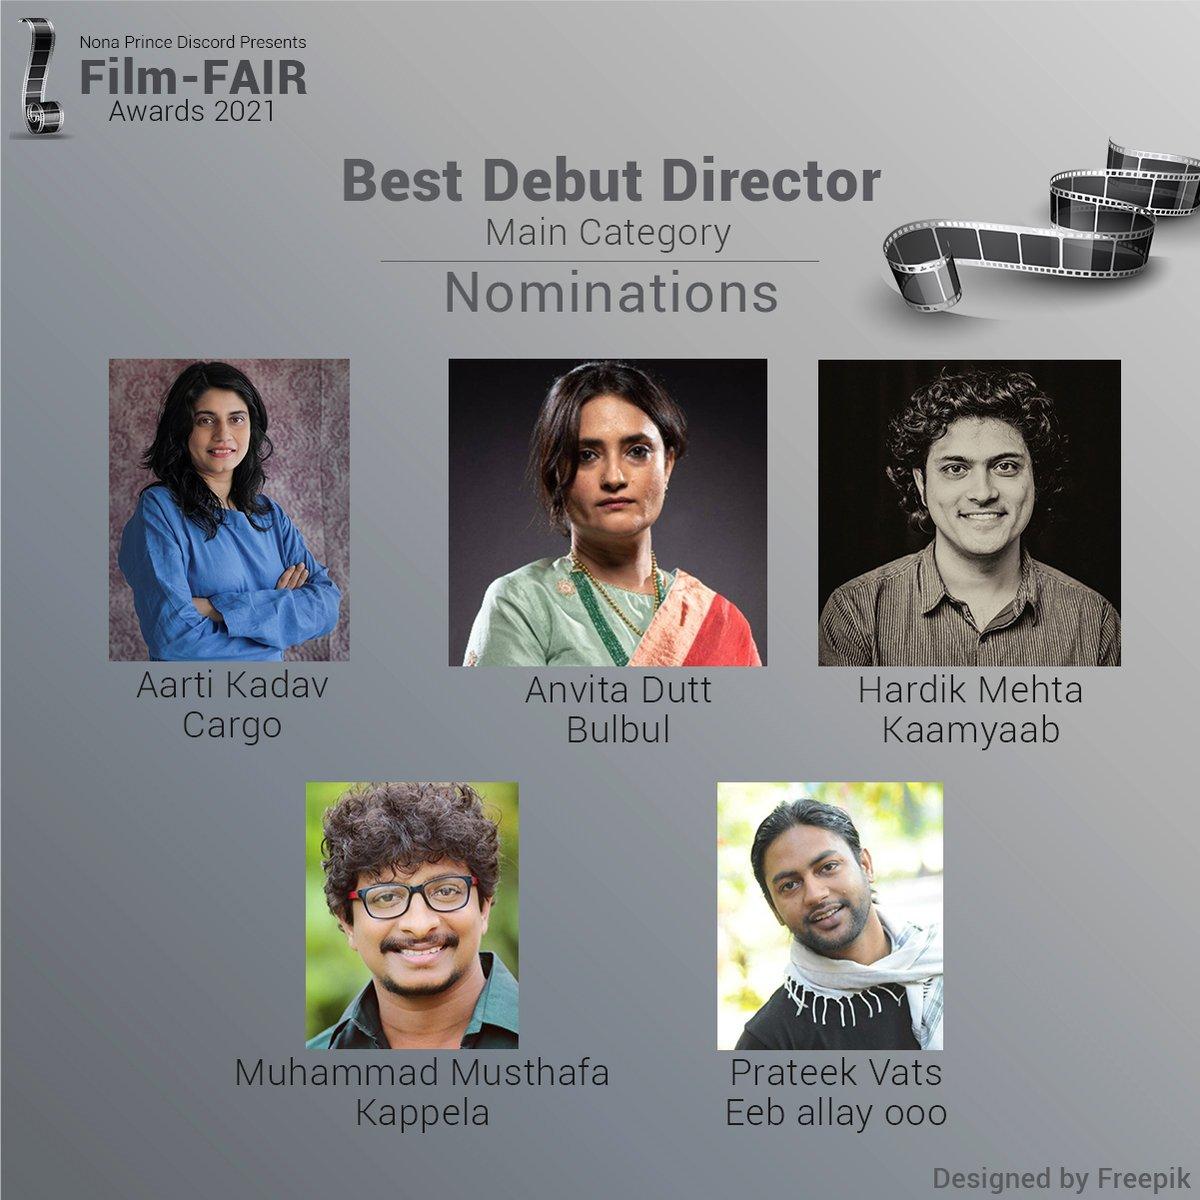 Nominations for Best Debut Director in 2020  Go Vote here -    @AratiKadav #cargo #AnvitaDutt #Bulbul #HardikMehta #Kaamyaab #MuhammadMusthafa #Kappela #PrateekVats #eeballayooo   #FilmFAIRAwards2021 #FilmFAIRNominations #Vote